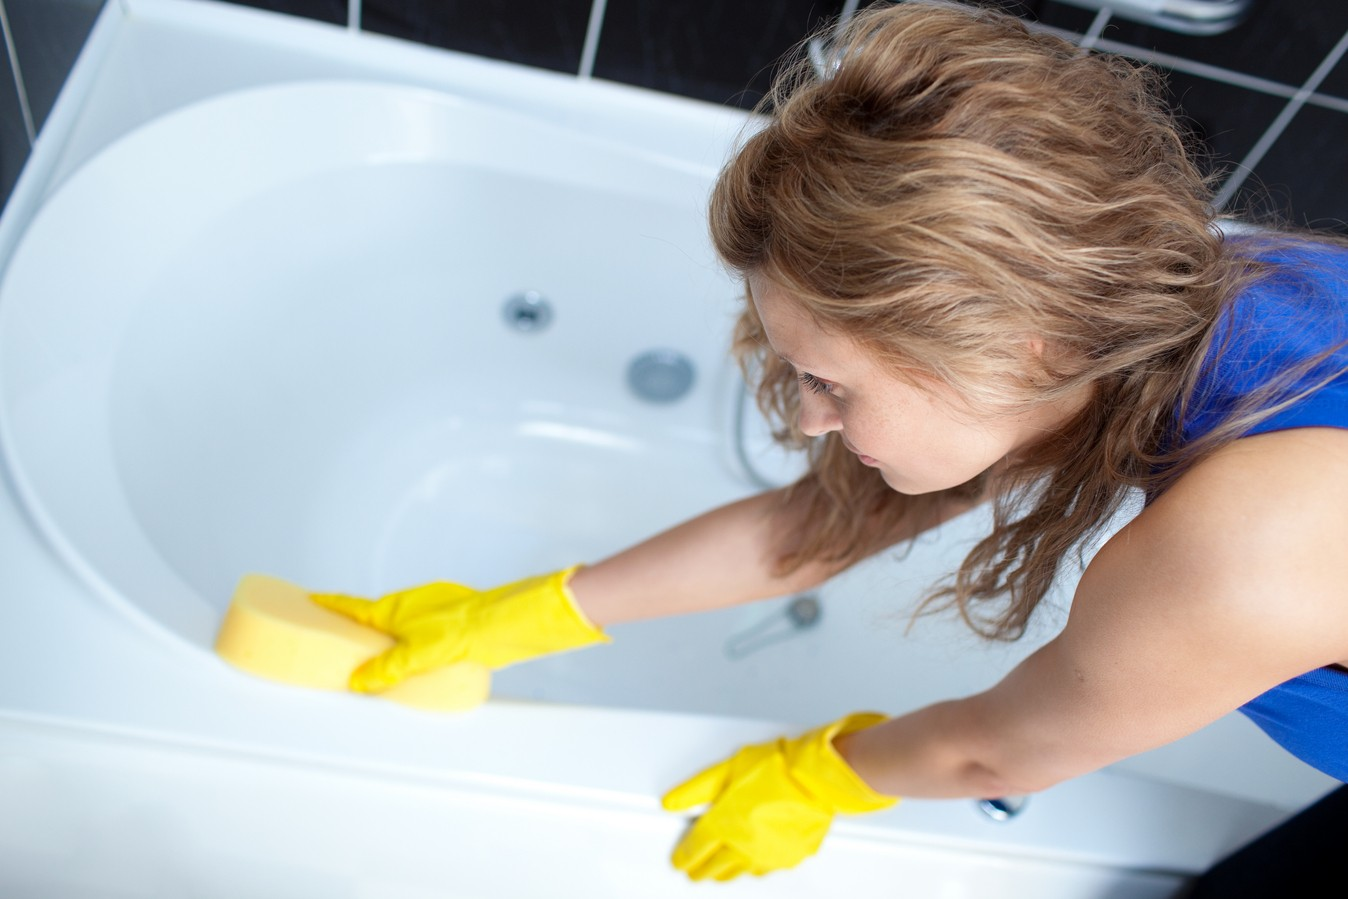 Правильная чистка ванны